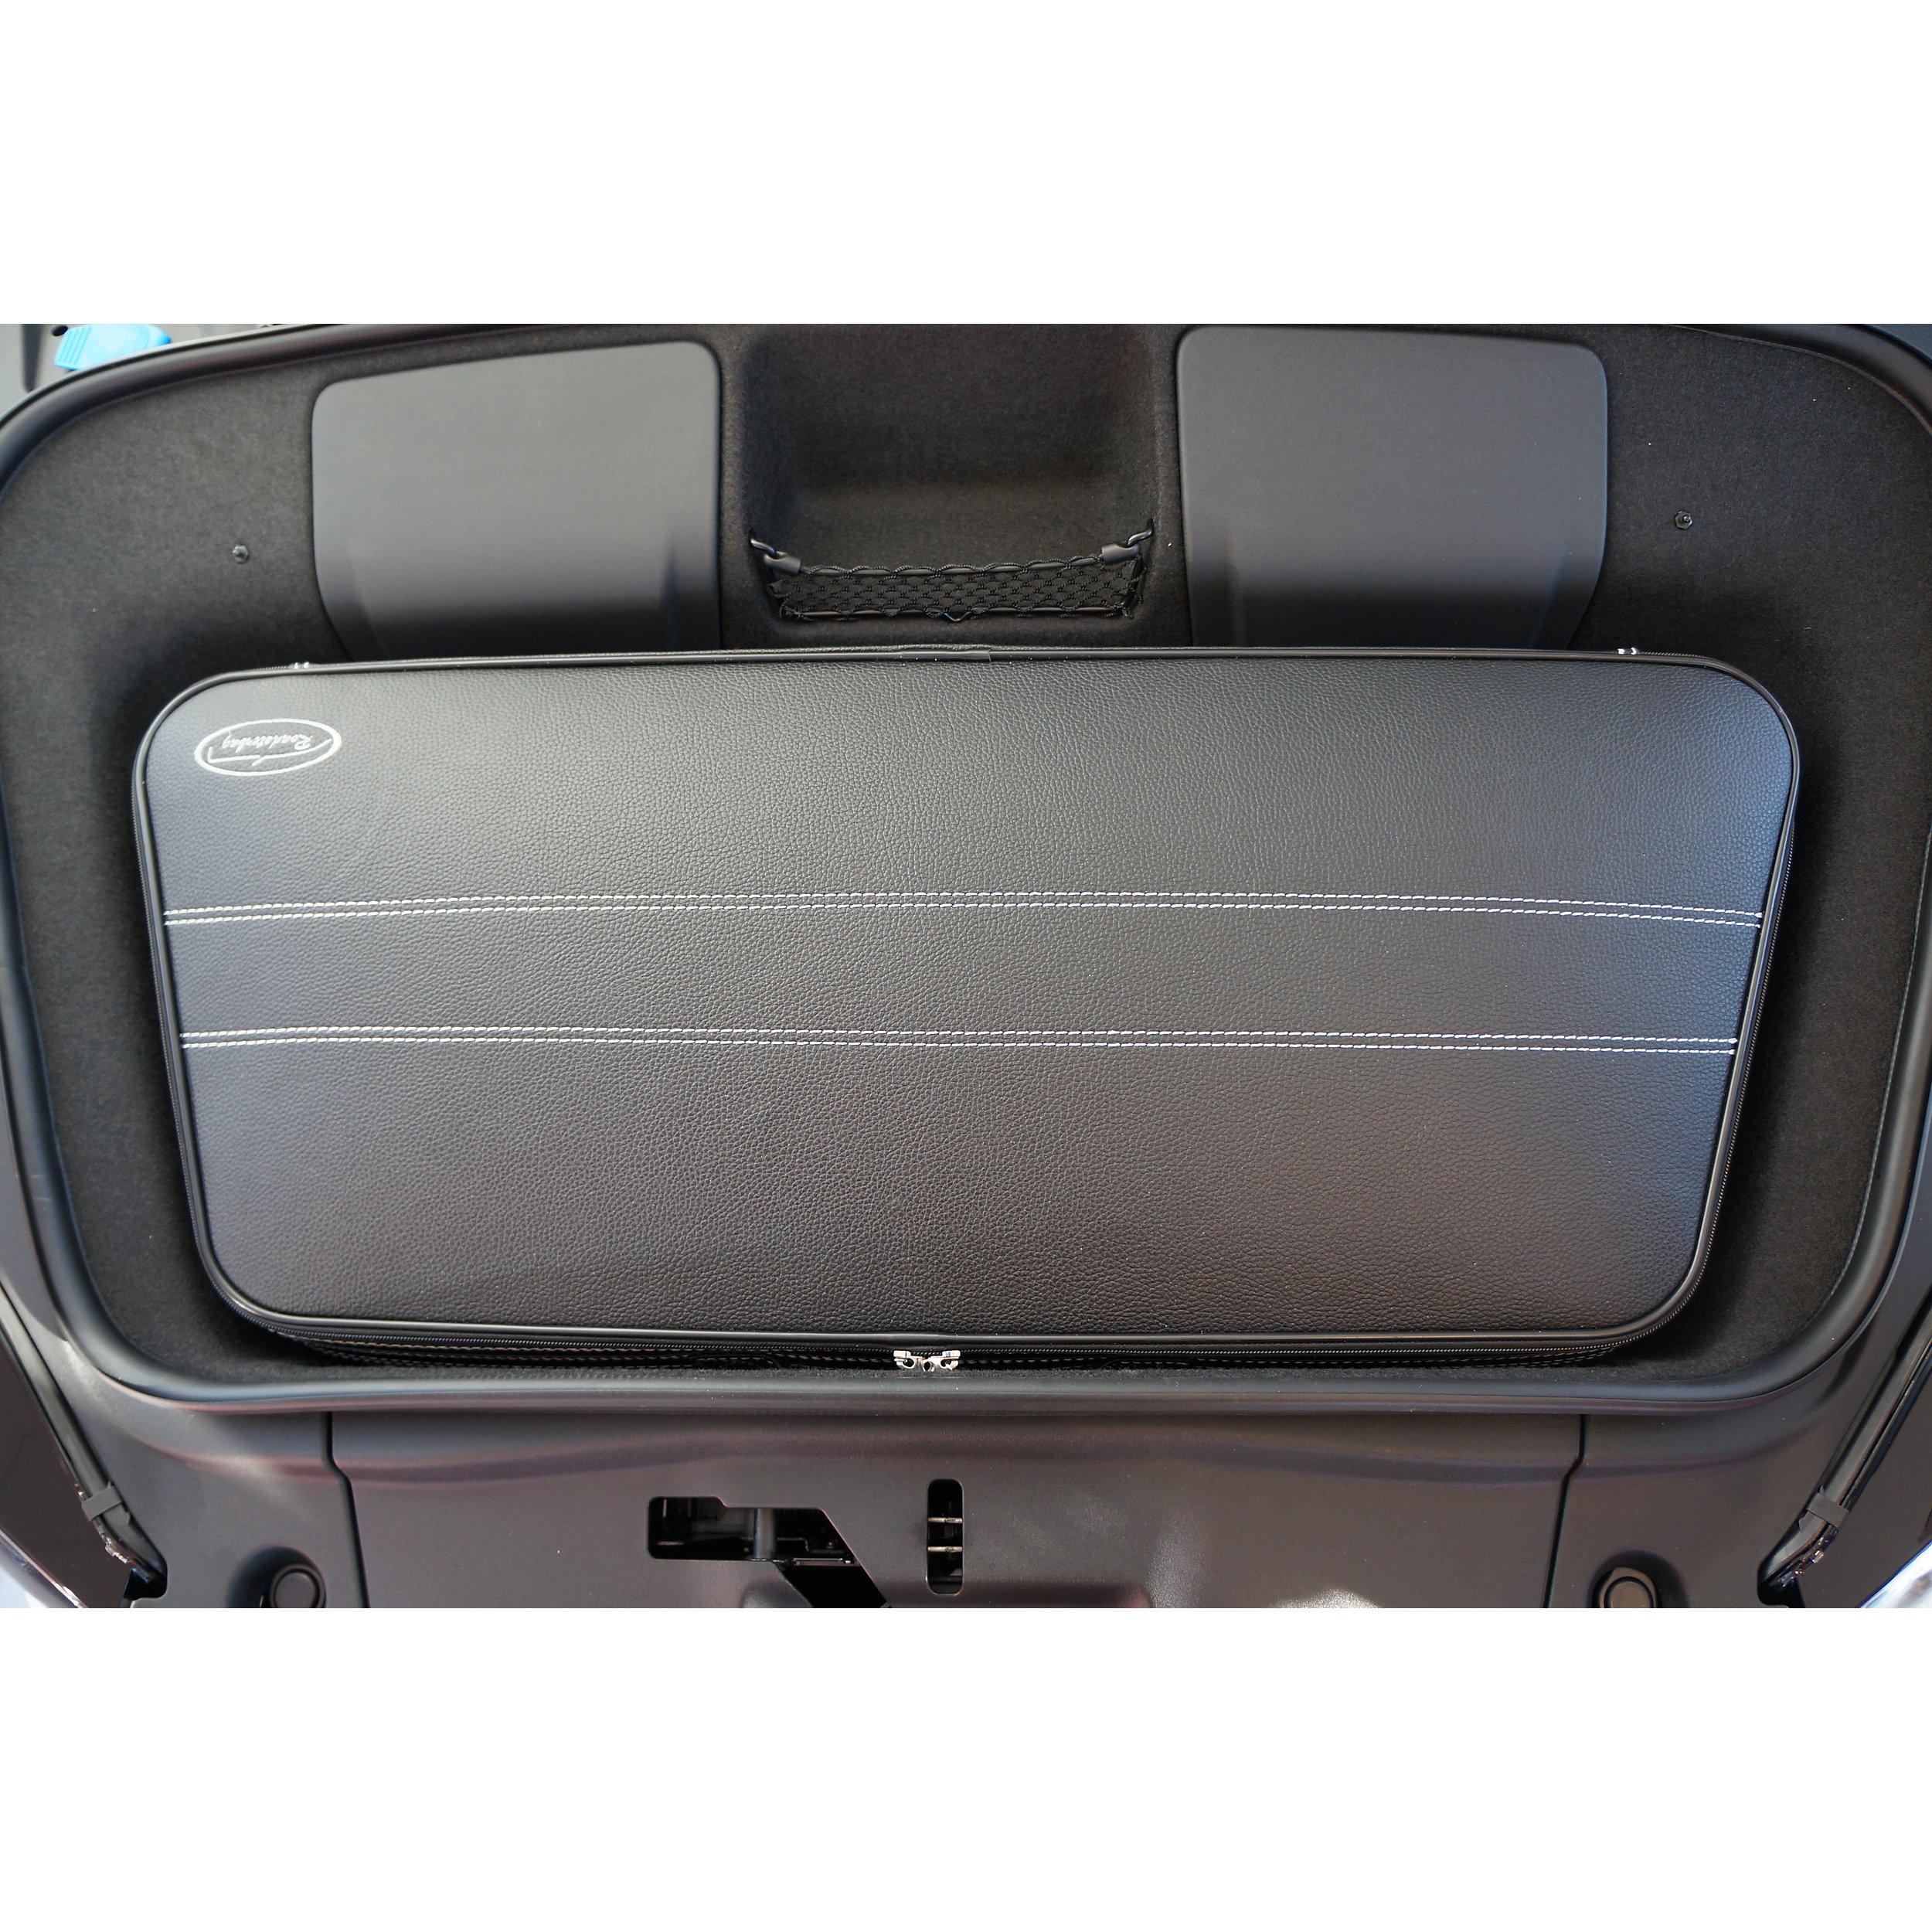 2-tlg. Kofferset Audi R8 4S Spyder/Roadster